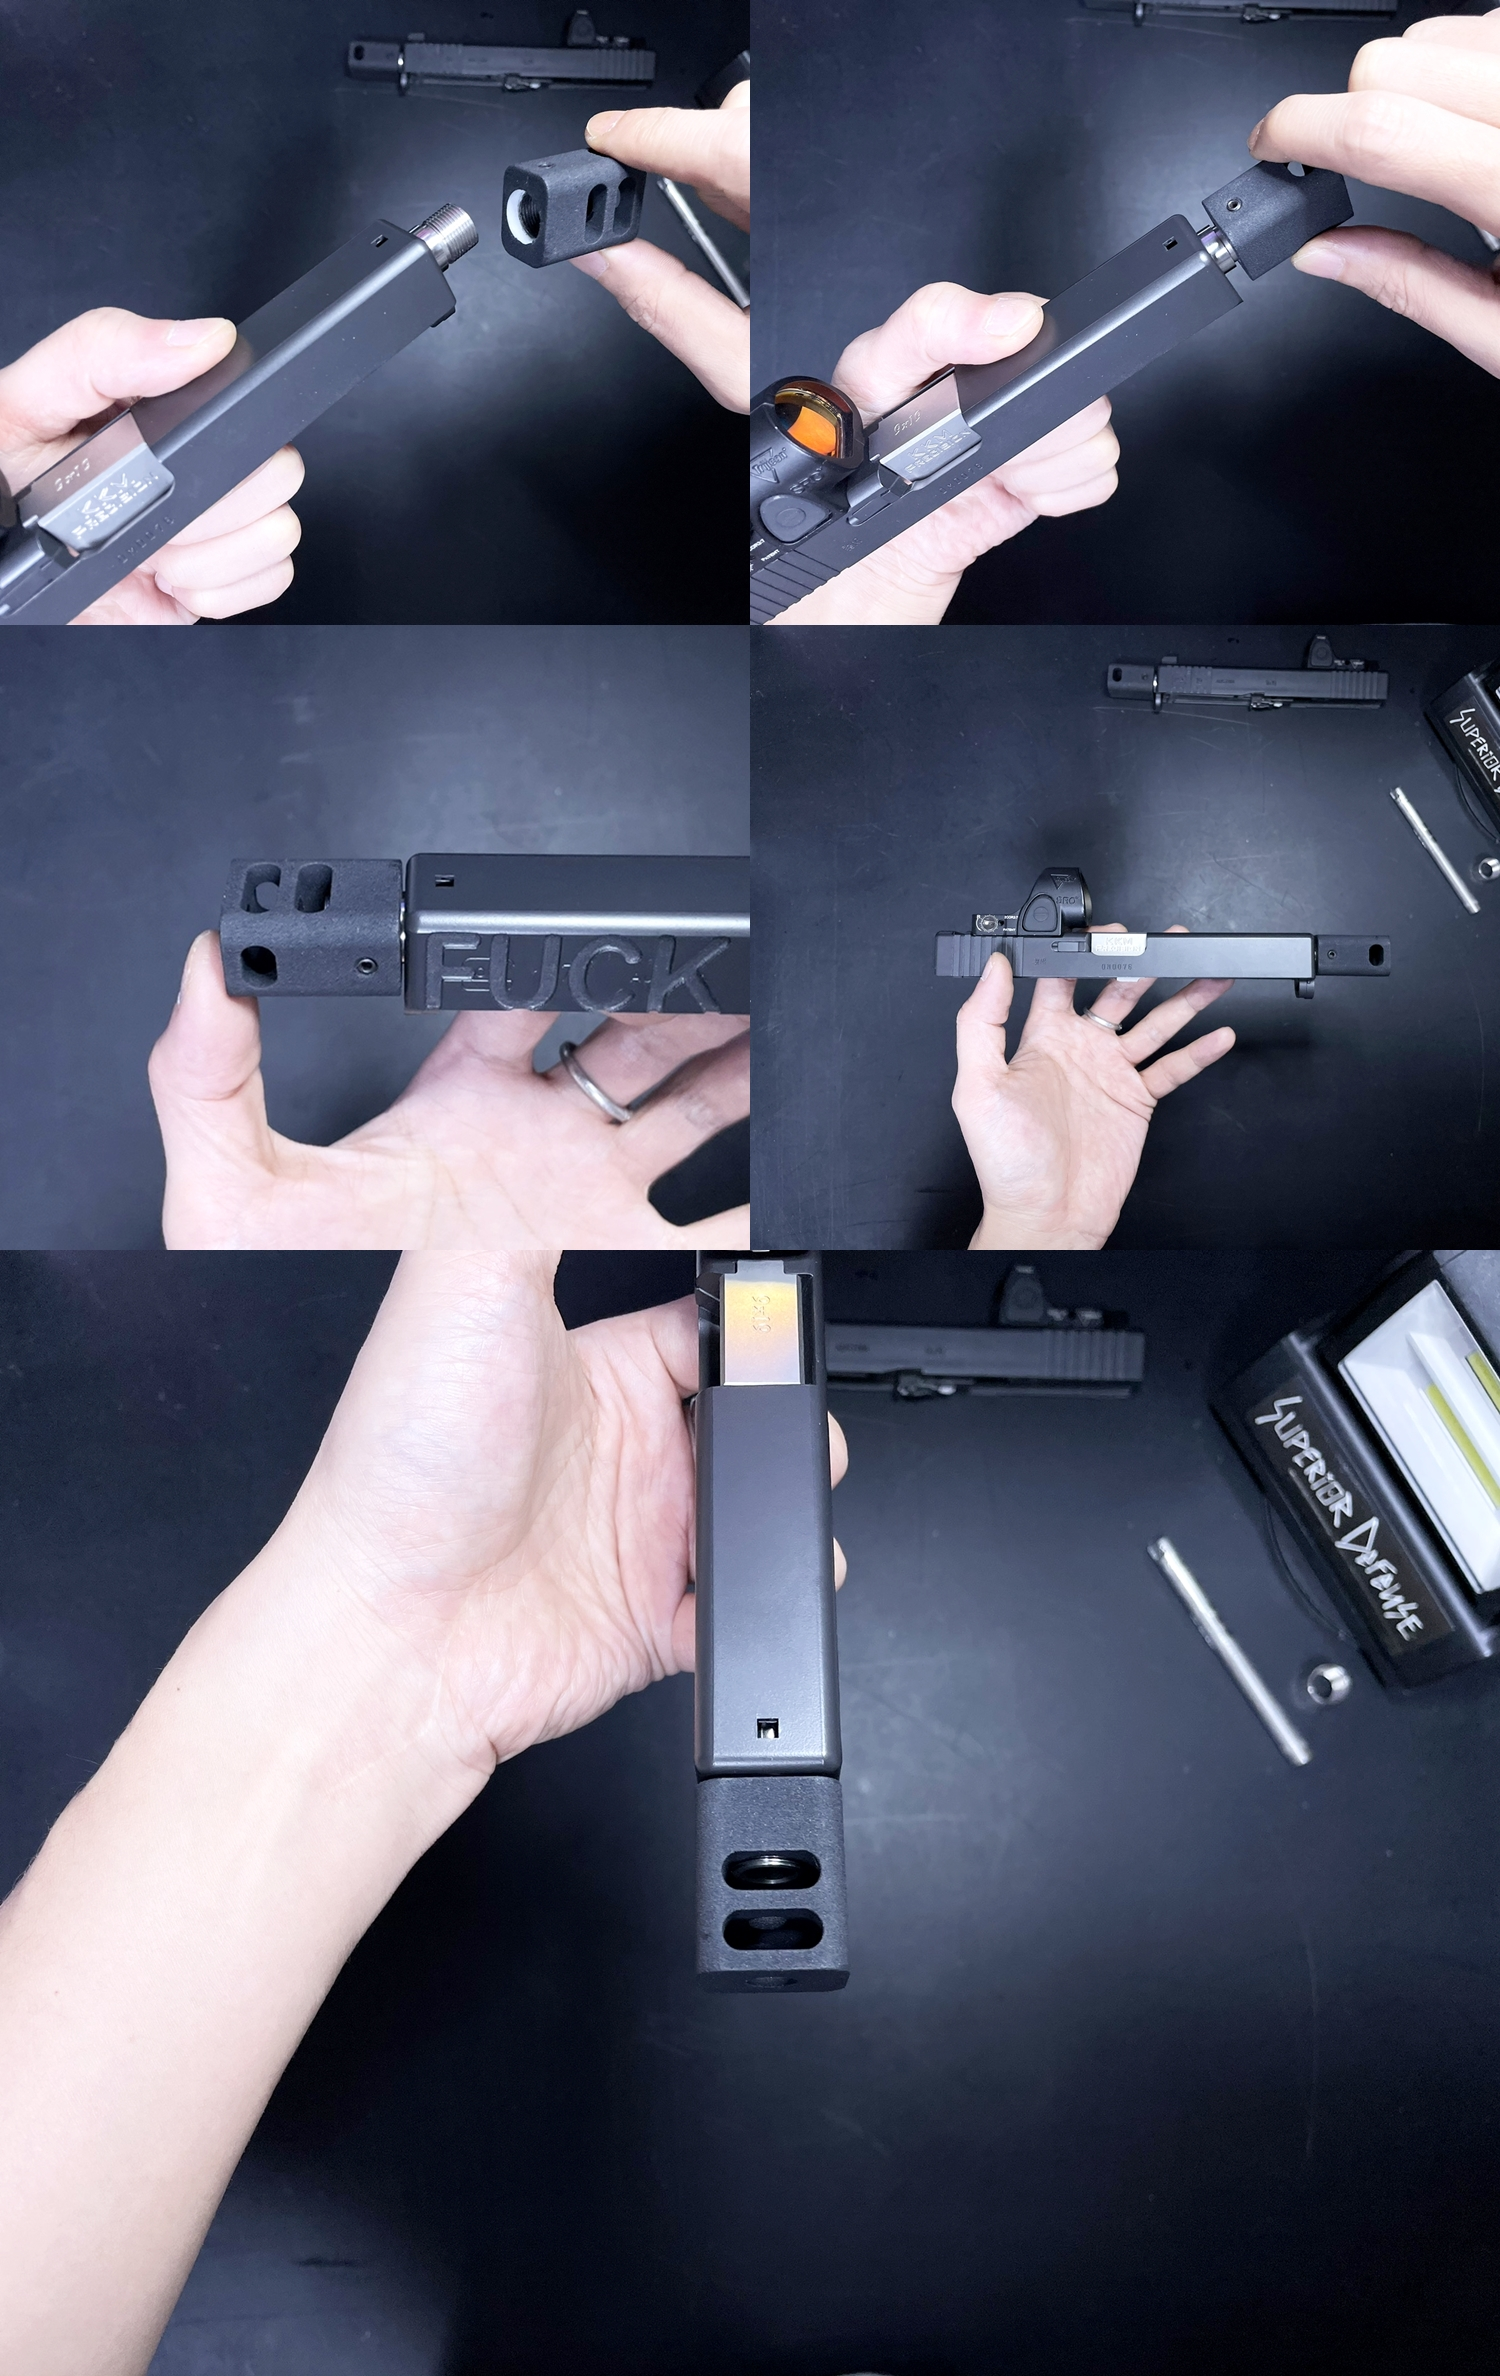 11 Guns Modify KKM PRECISION GLOCK ステンレスアウターバレル 東京マルイ G17 G18C GBB GET! リアルで重量感あるCNC 精密切り出し加工! BARREL+PROTECTOR+ショートリコイルアシストスプリング+インナーバレルセッ